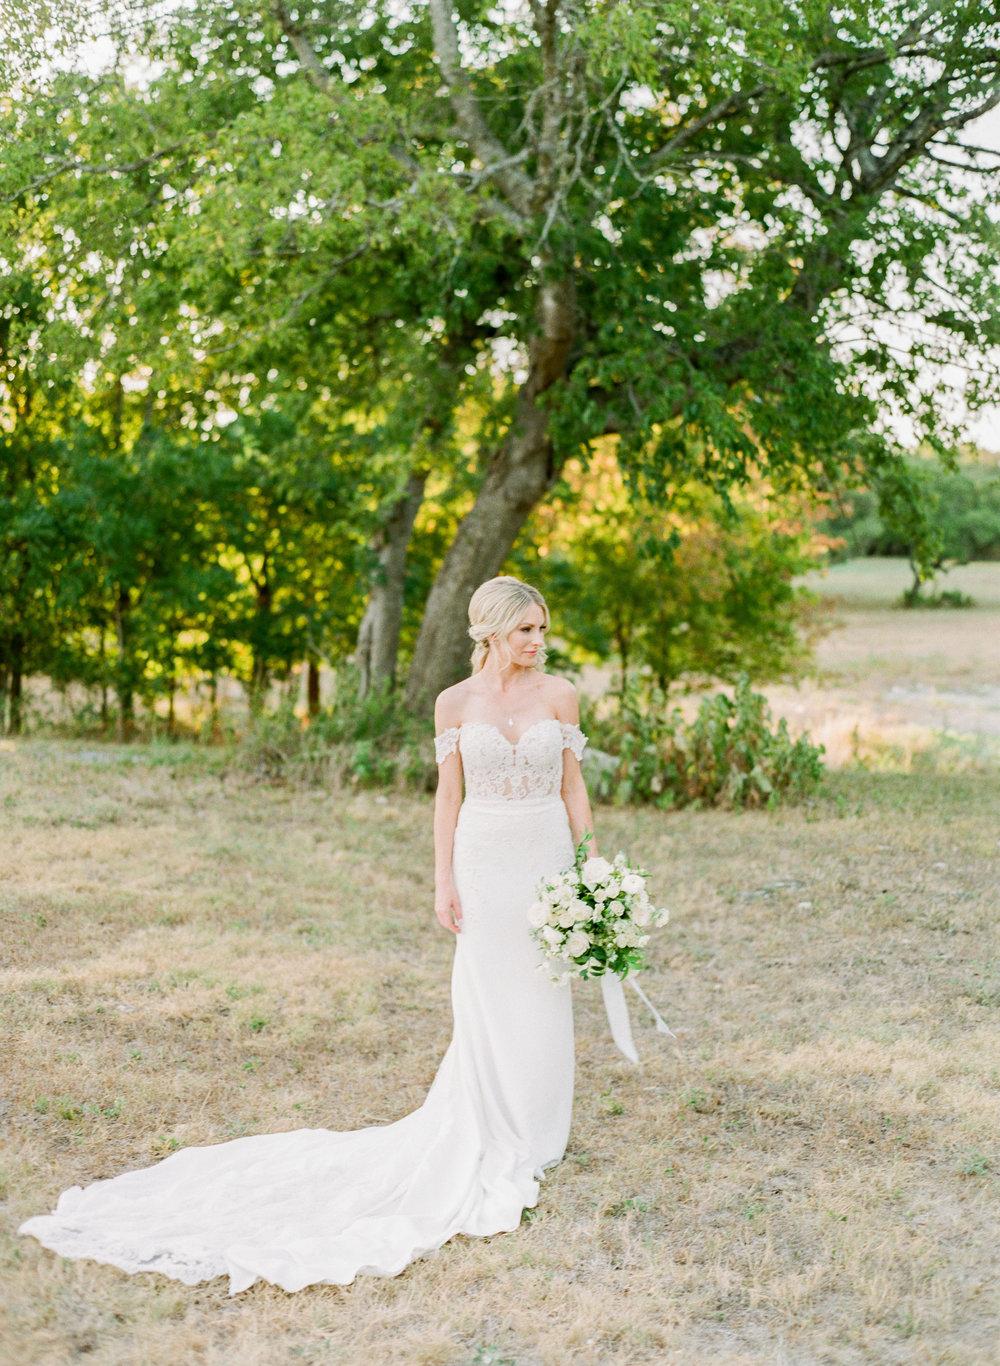 ally-bridals-48.jpg